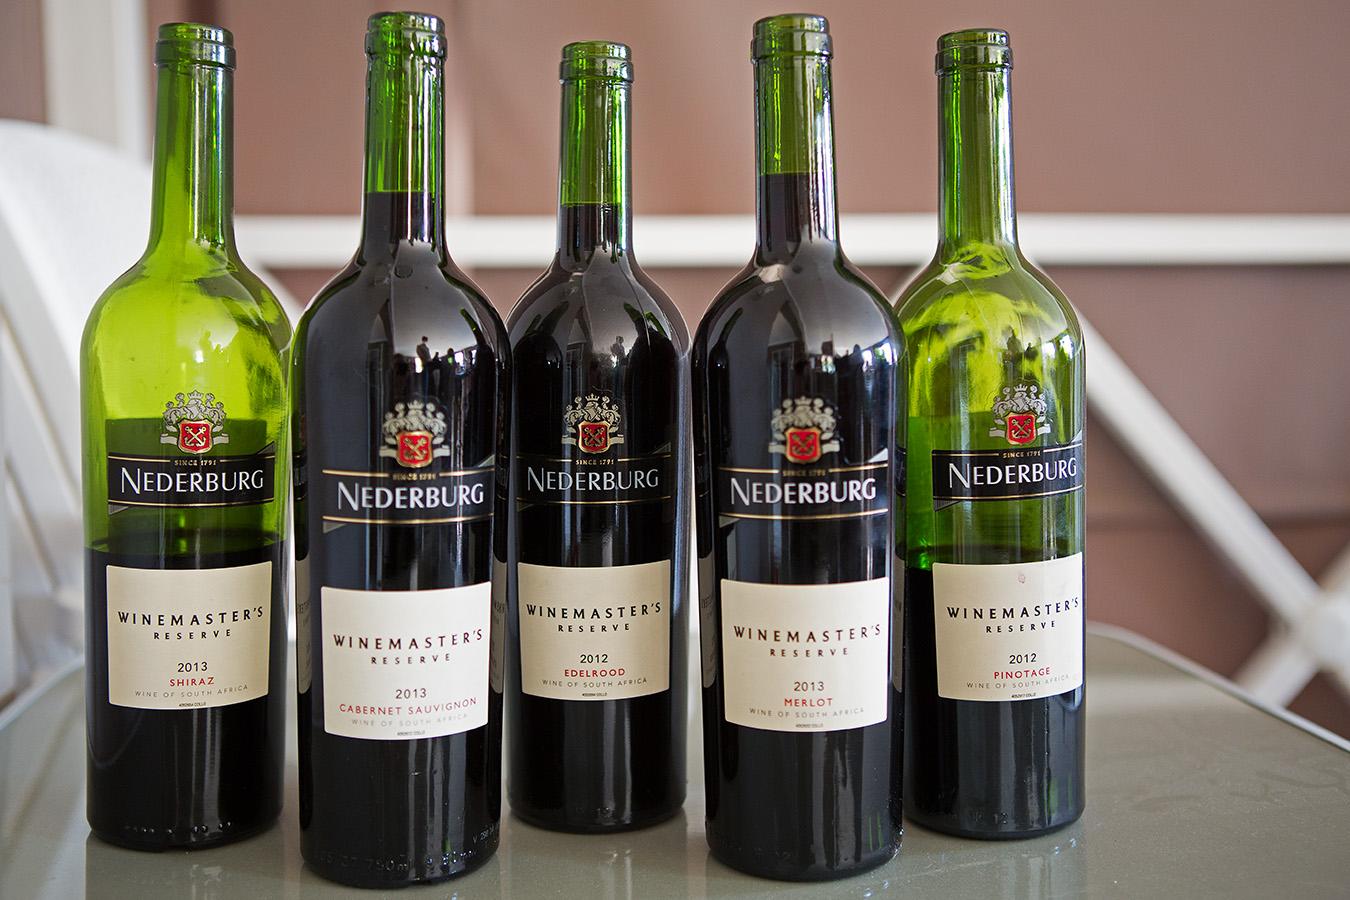 Nederburg Winemaster's Reserve Red Wines - Shiraz 2013, Cab Sauv 2013, Elderood 2012, Merlot 2013 & Pinotage 2012